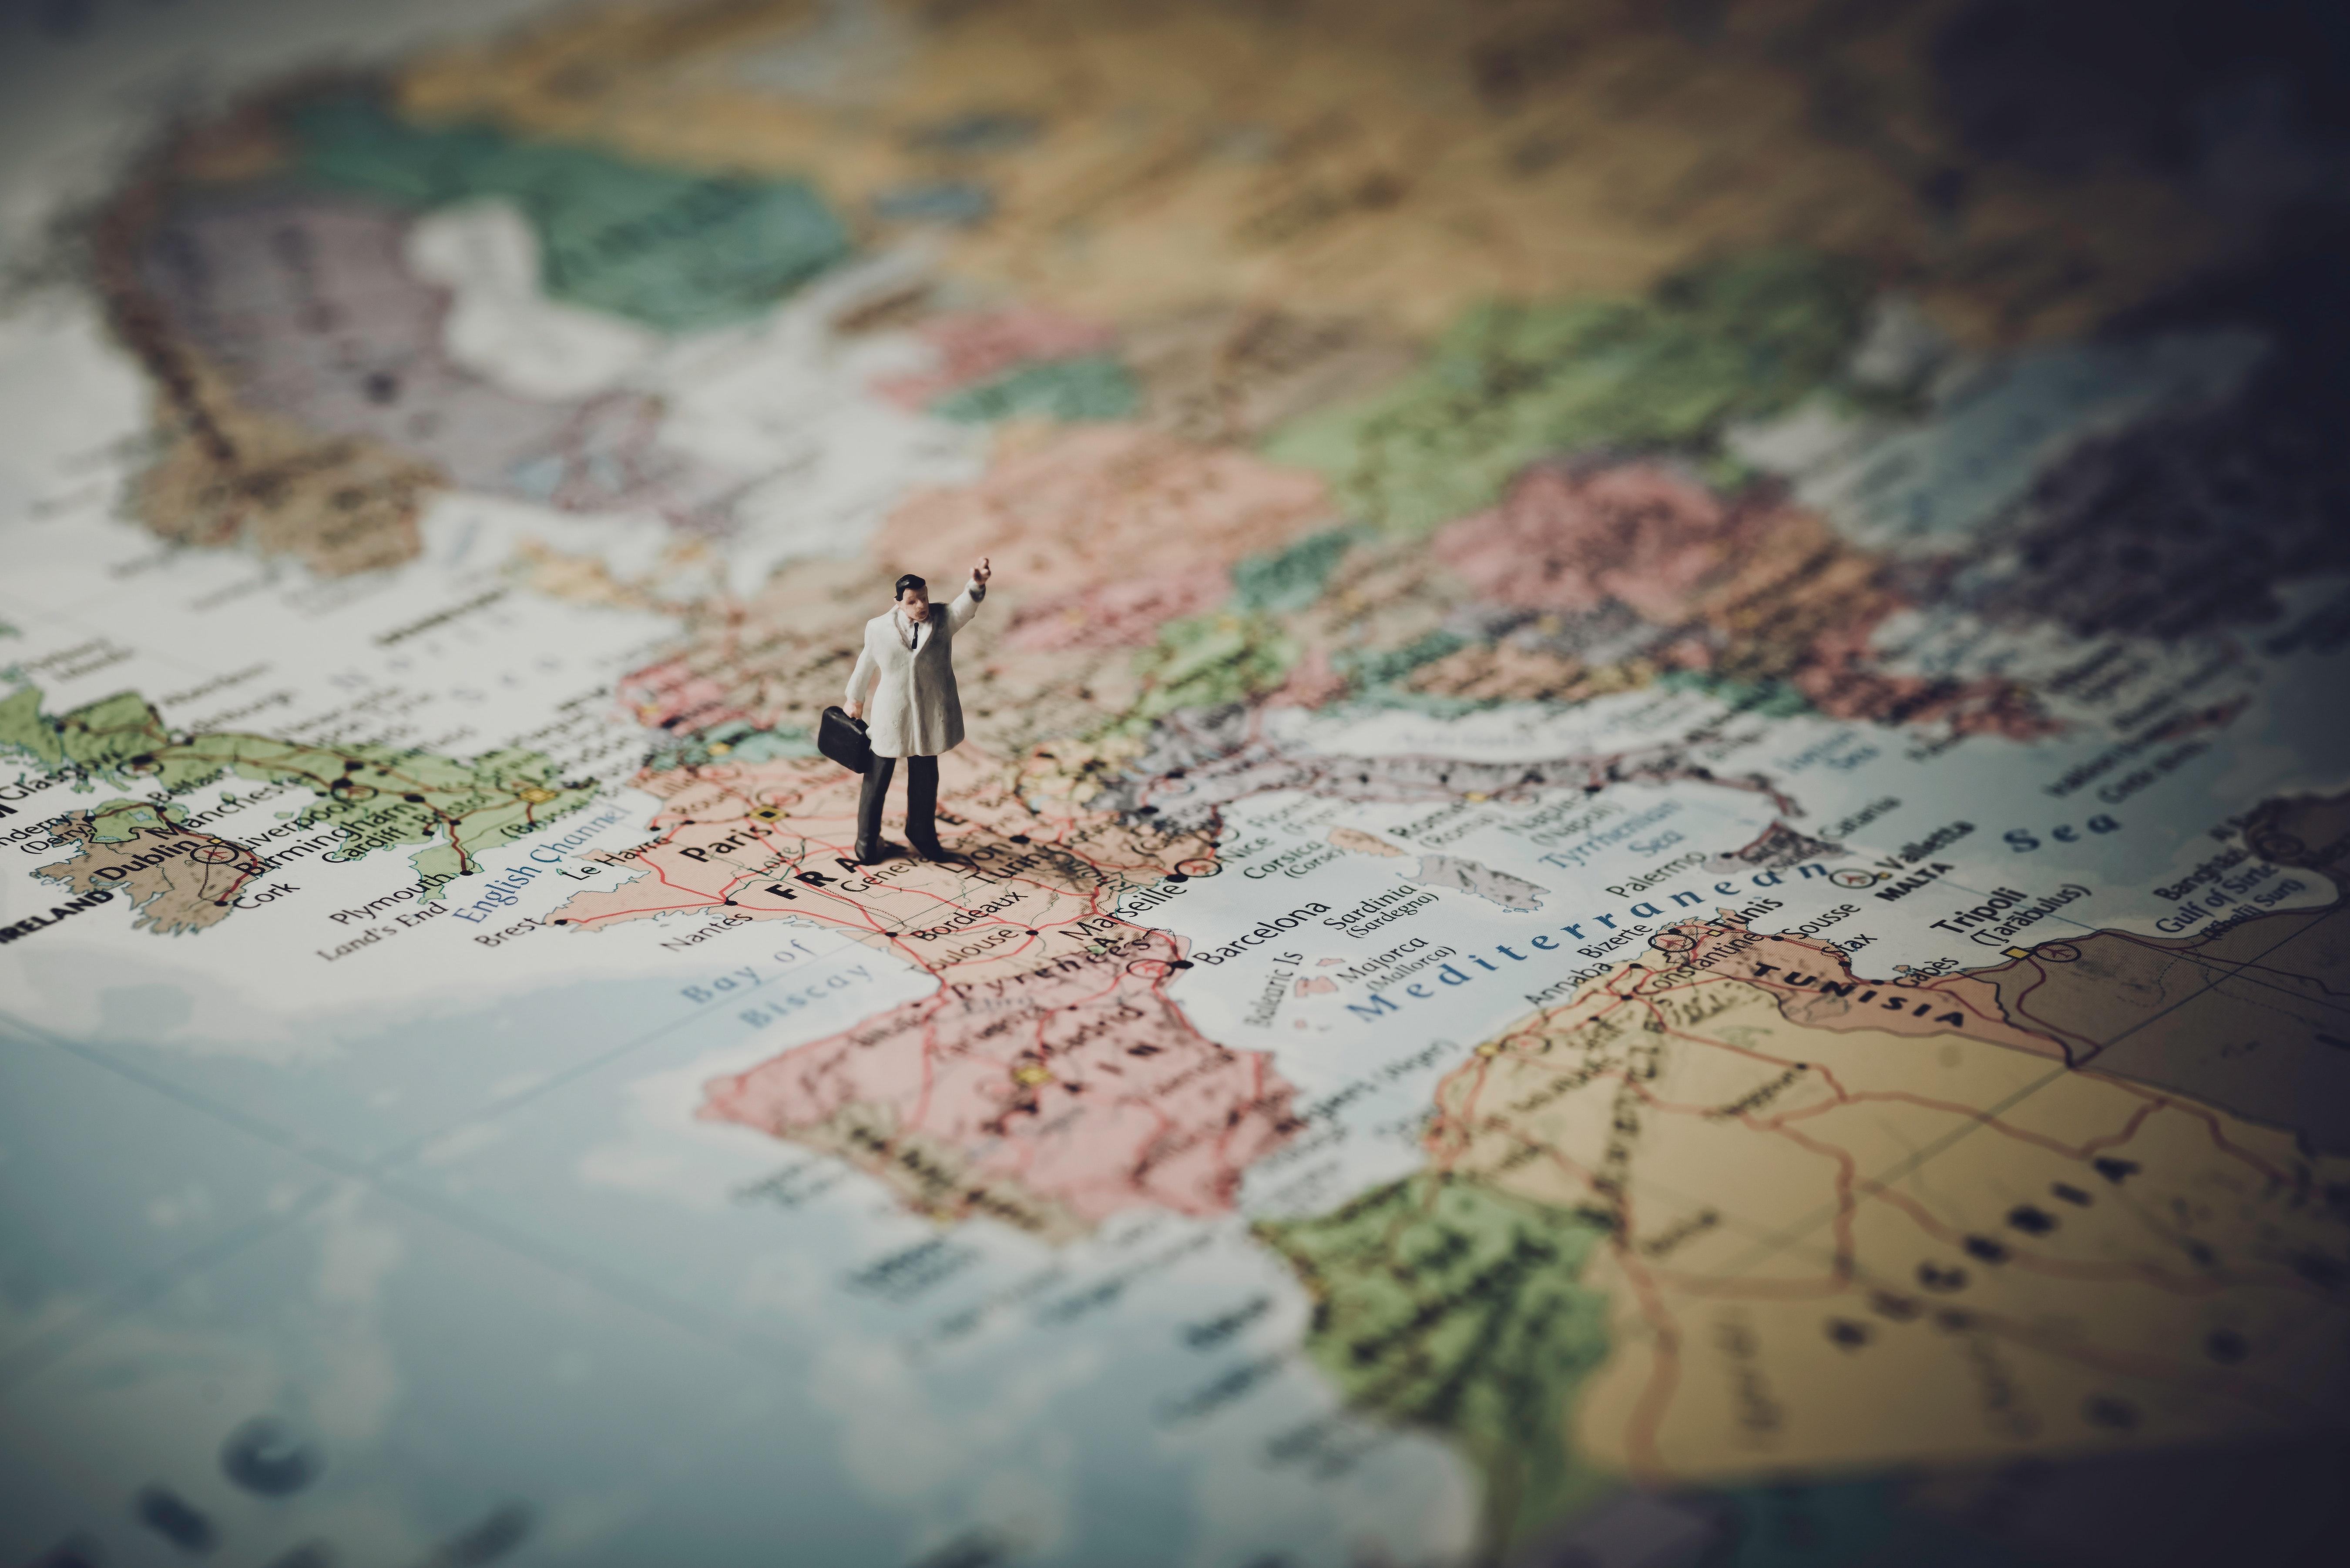 https://thehumanwell.com/wp-content/uploads/GBV_Issue_2016_008_-_Pittman-Richter_-_Selecting_Expatriates.pdf, Managing Expatriates, Expatriate Flight Risk, ROI on Expatriate Management